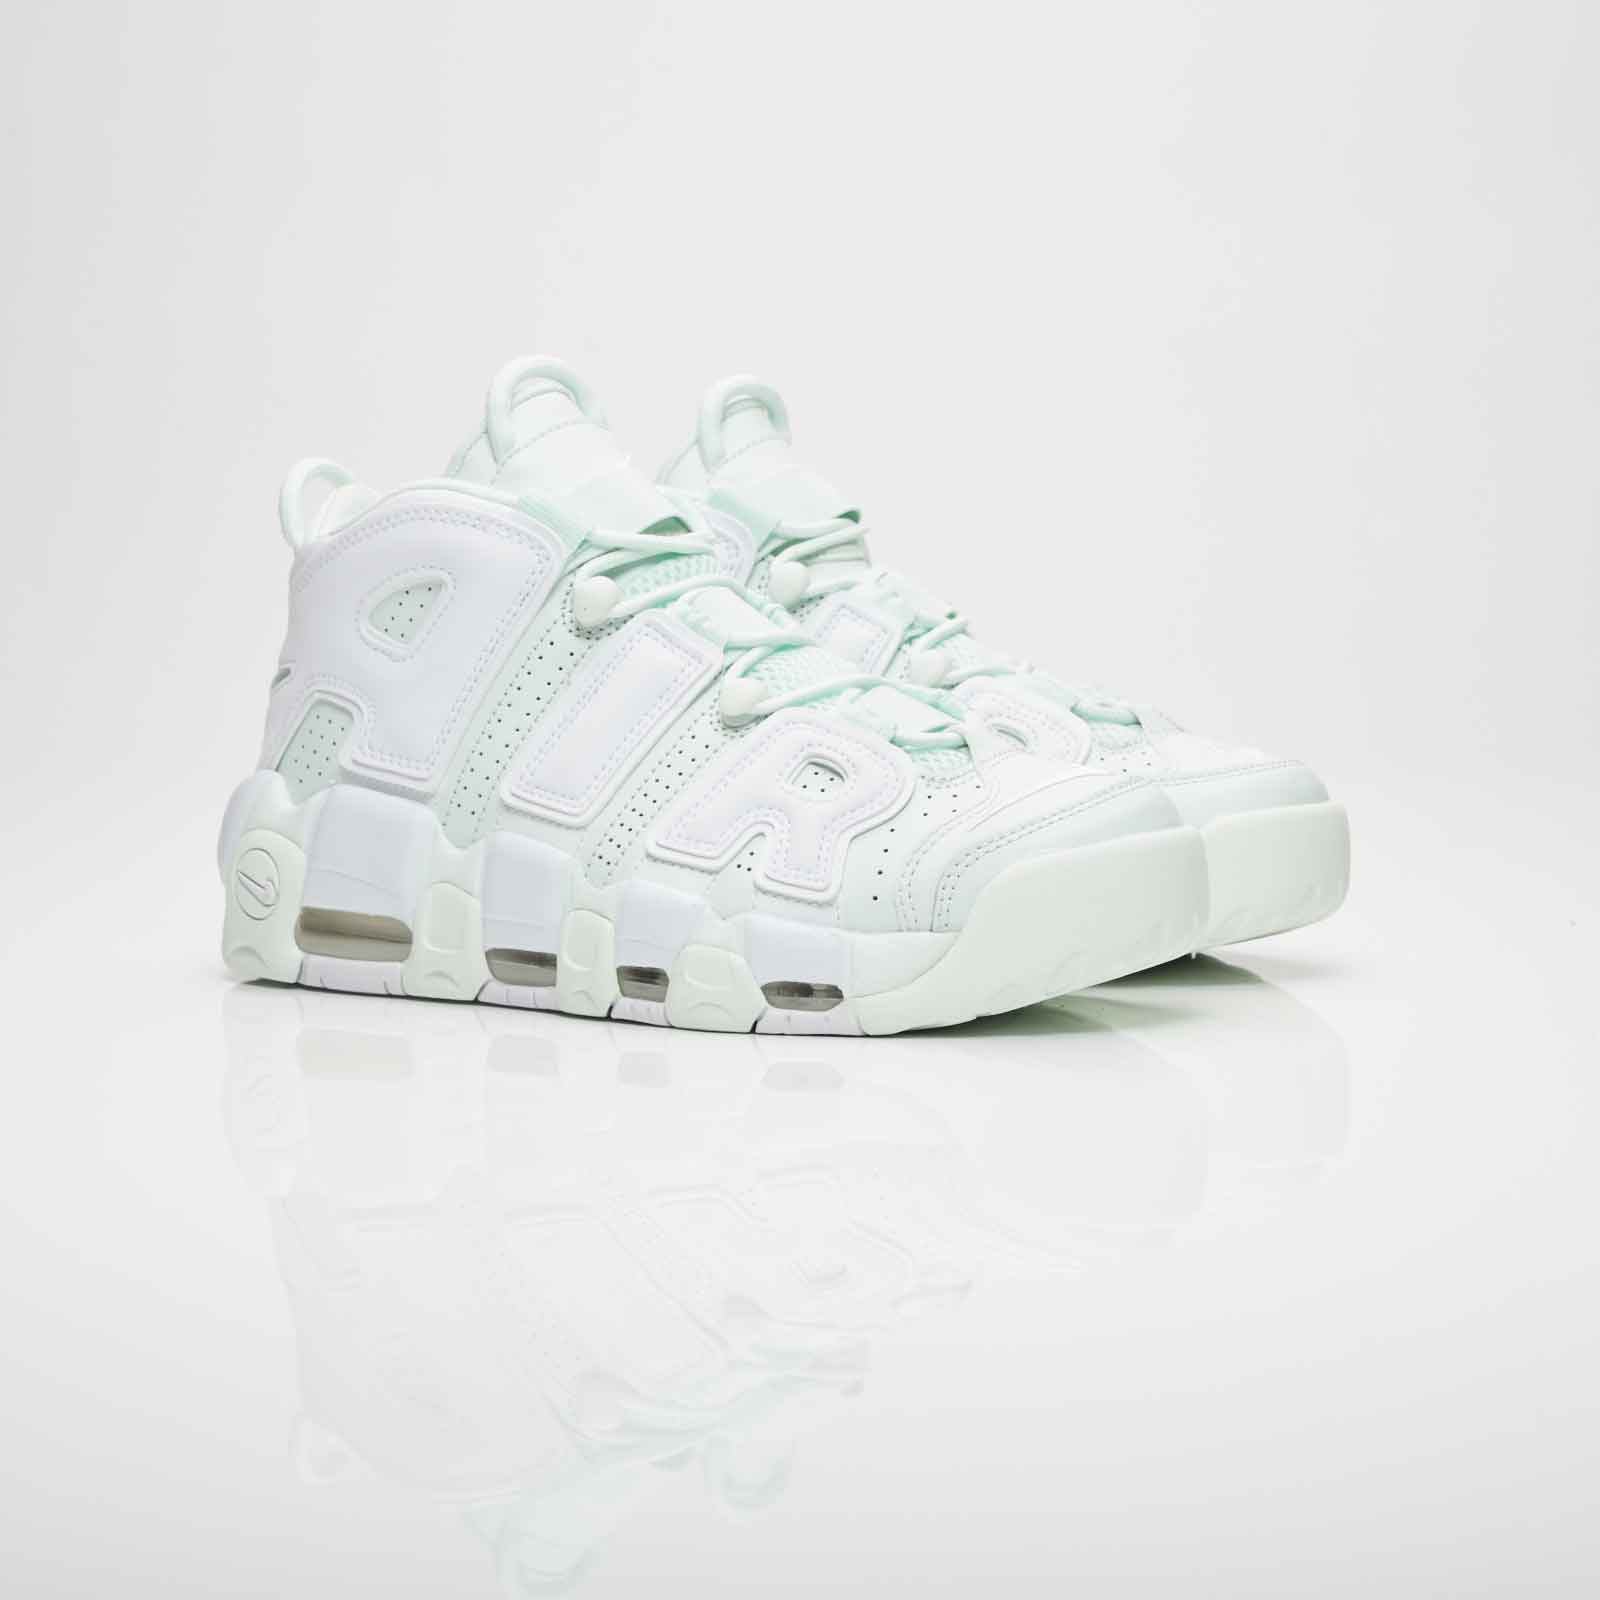 Nike Wmns Air More Uptempo - 917593-300 - Sneakersnstuff  02b054ada